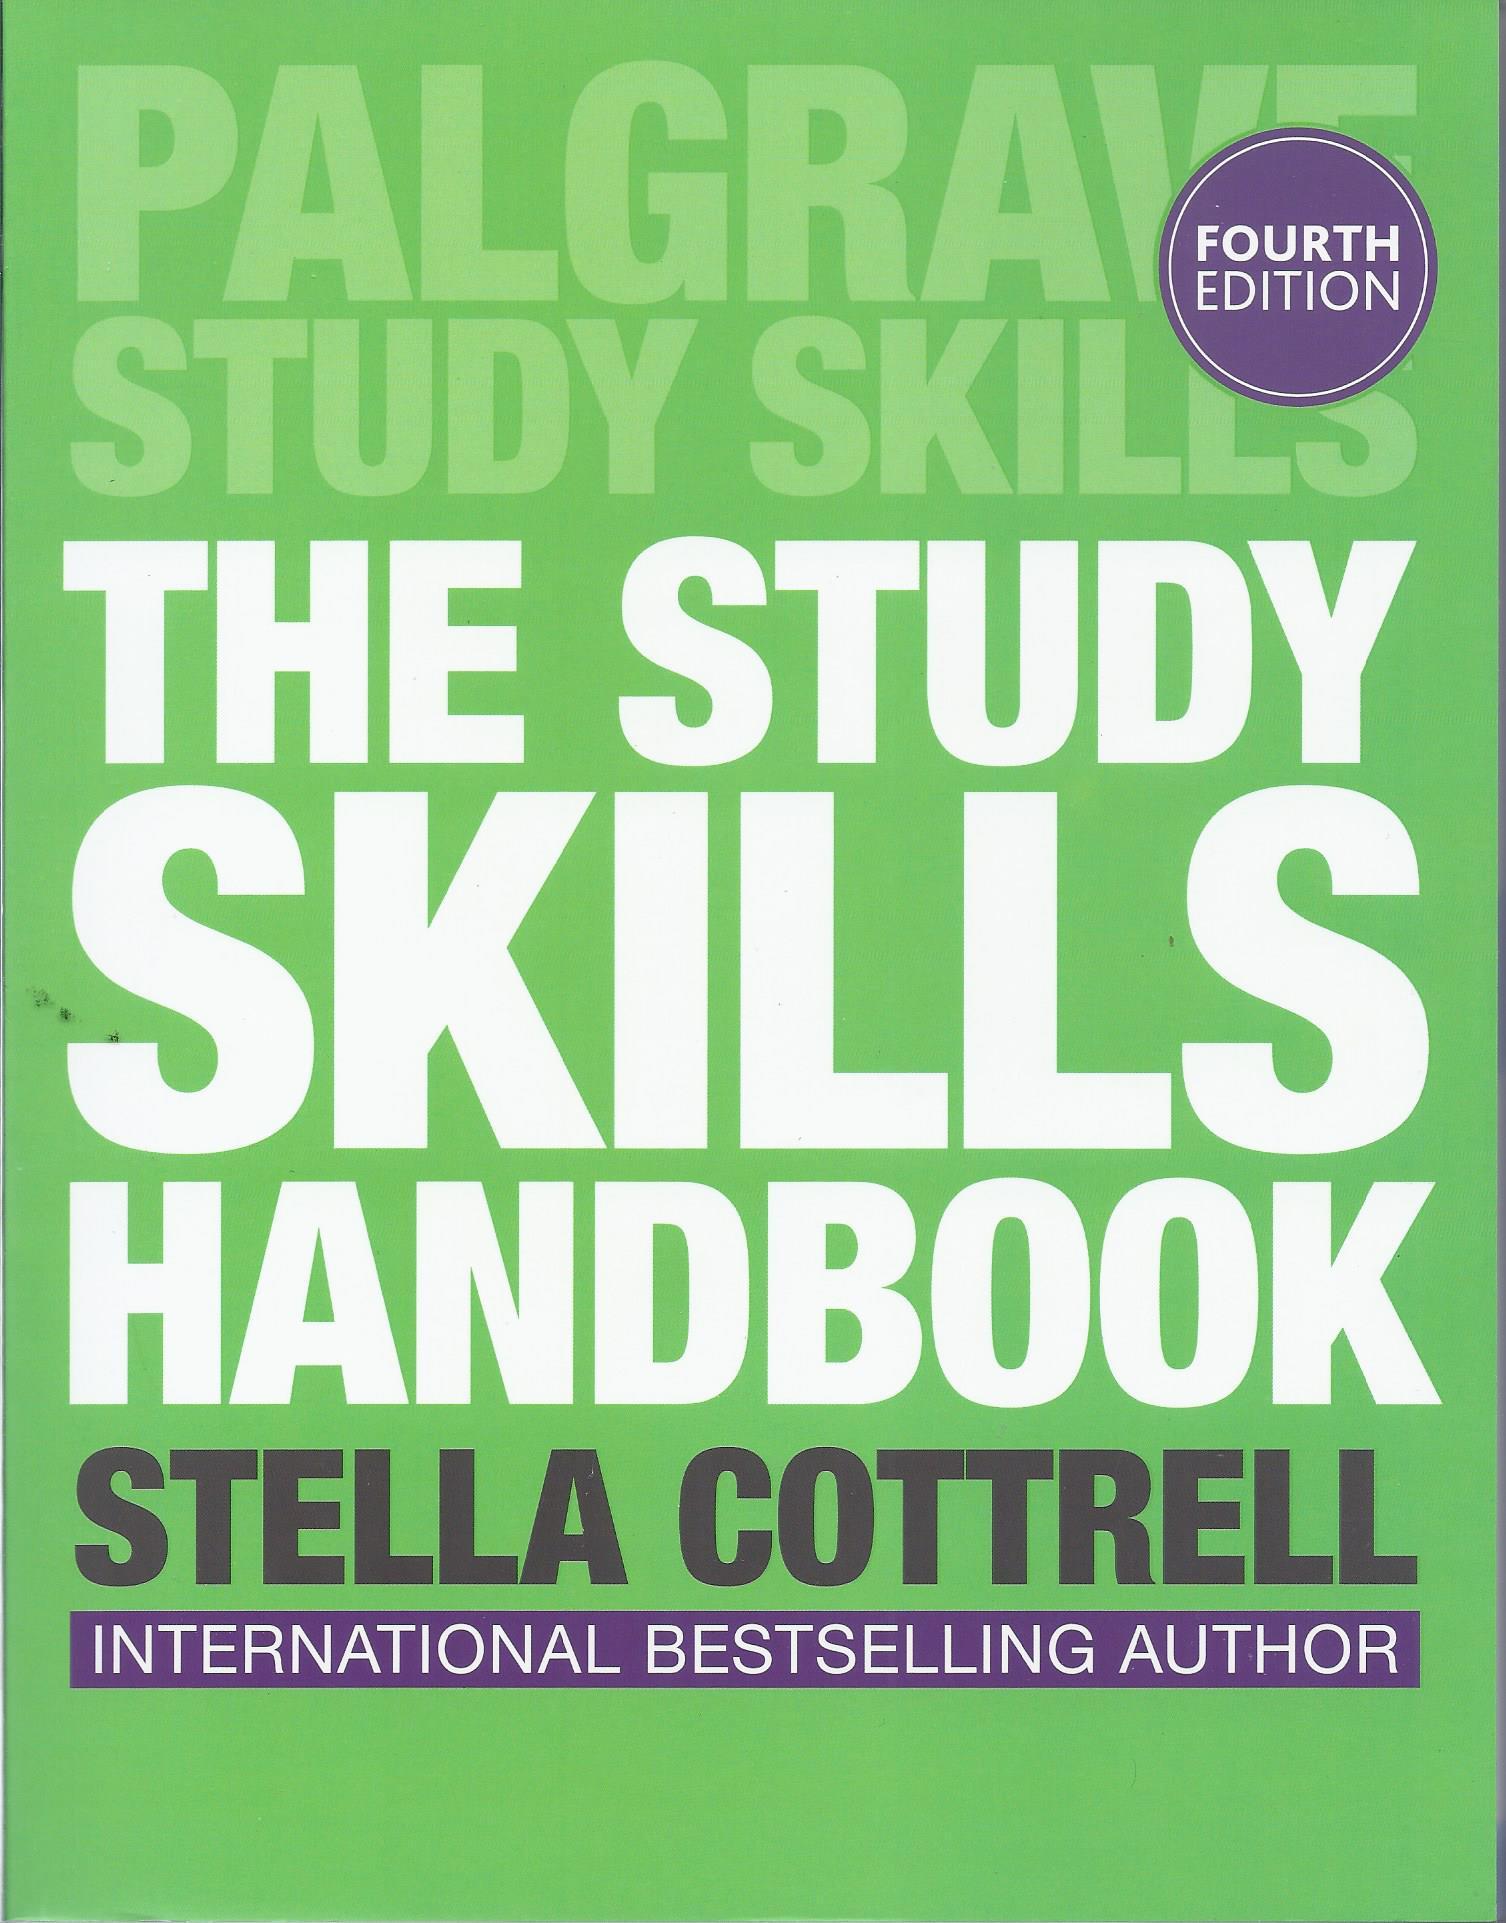 The Study Skills Handbook-452